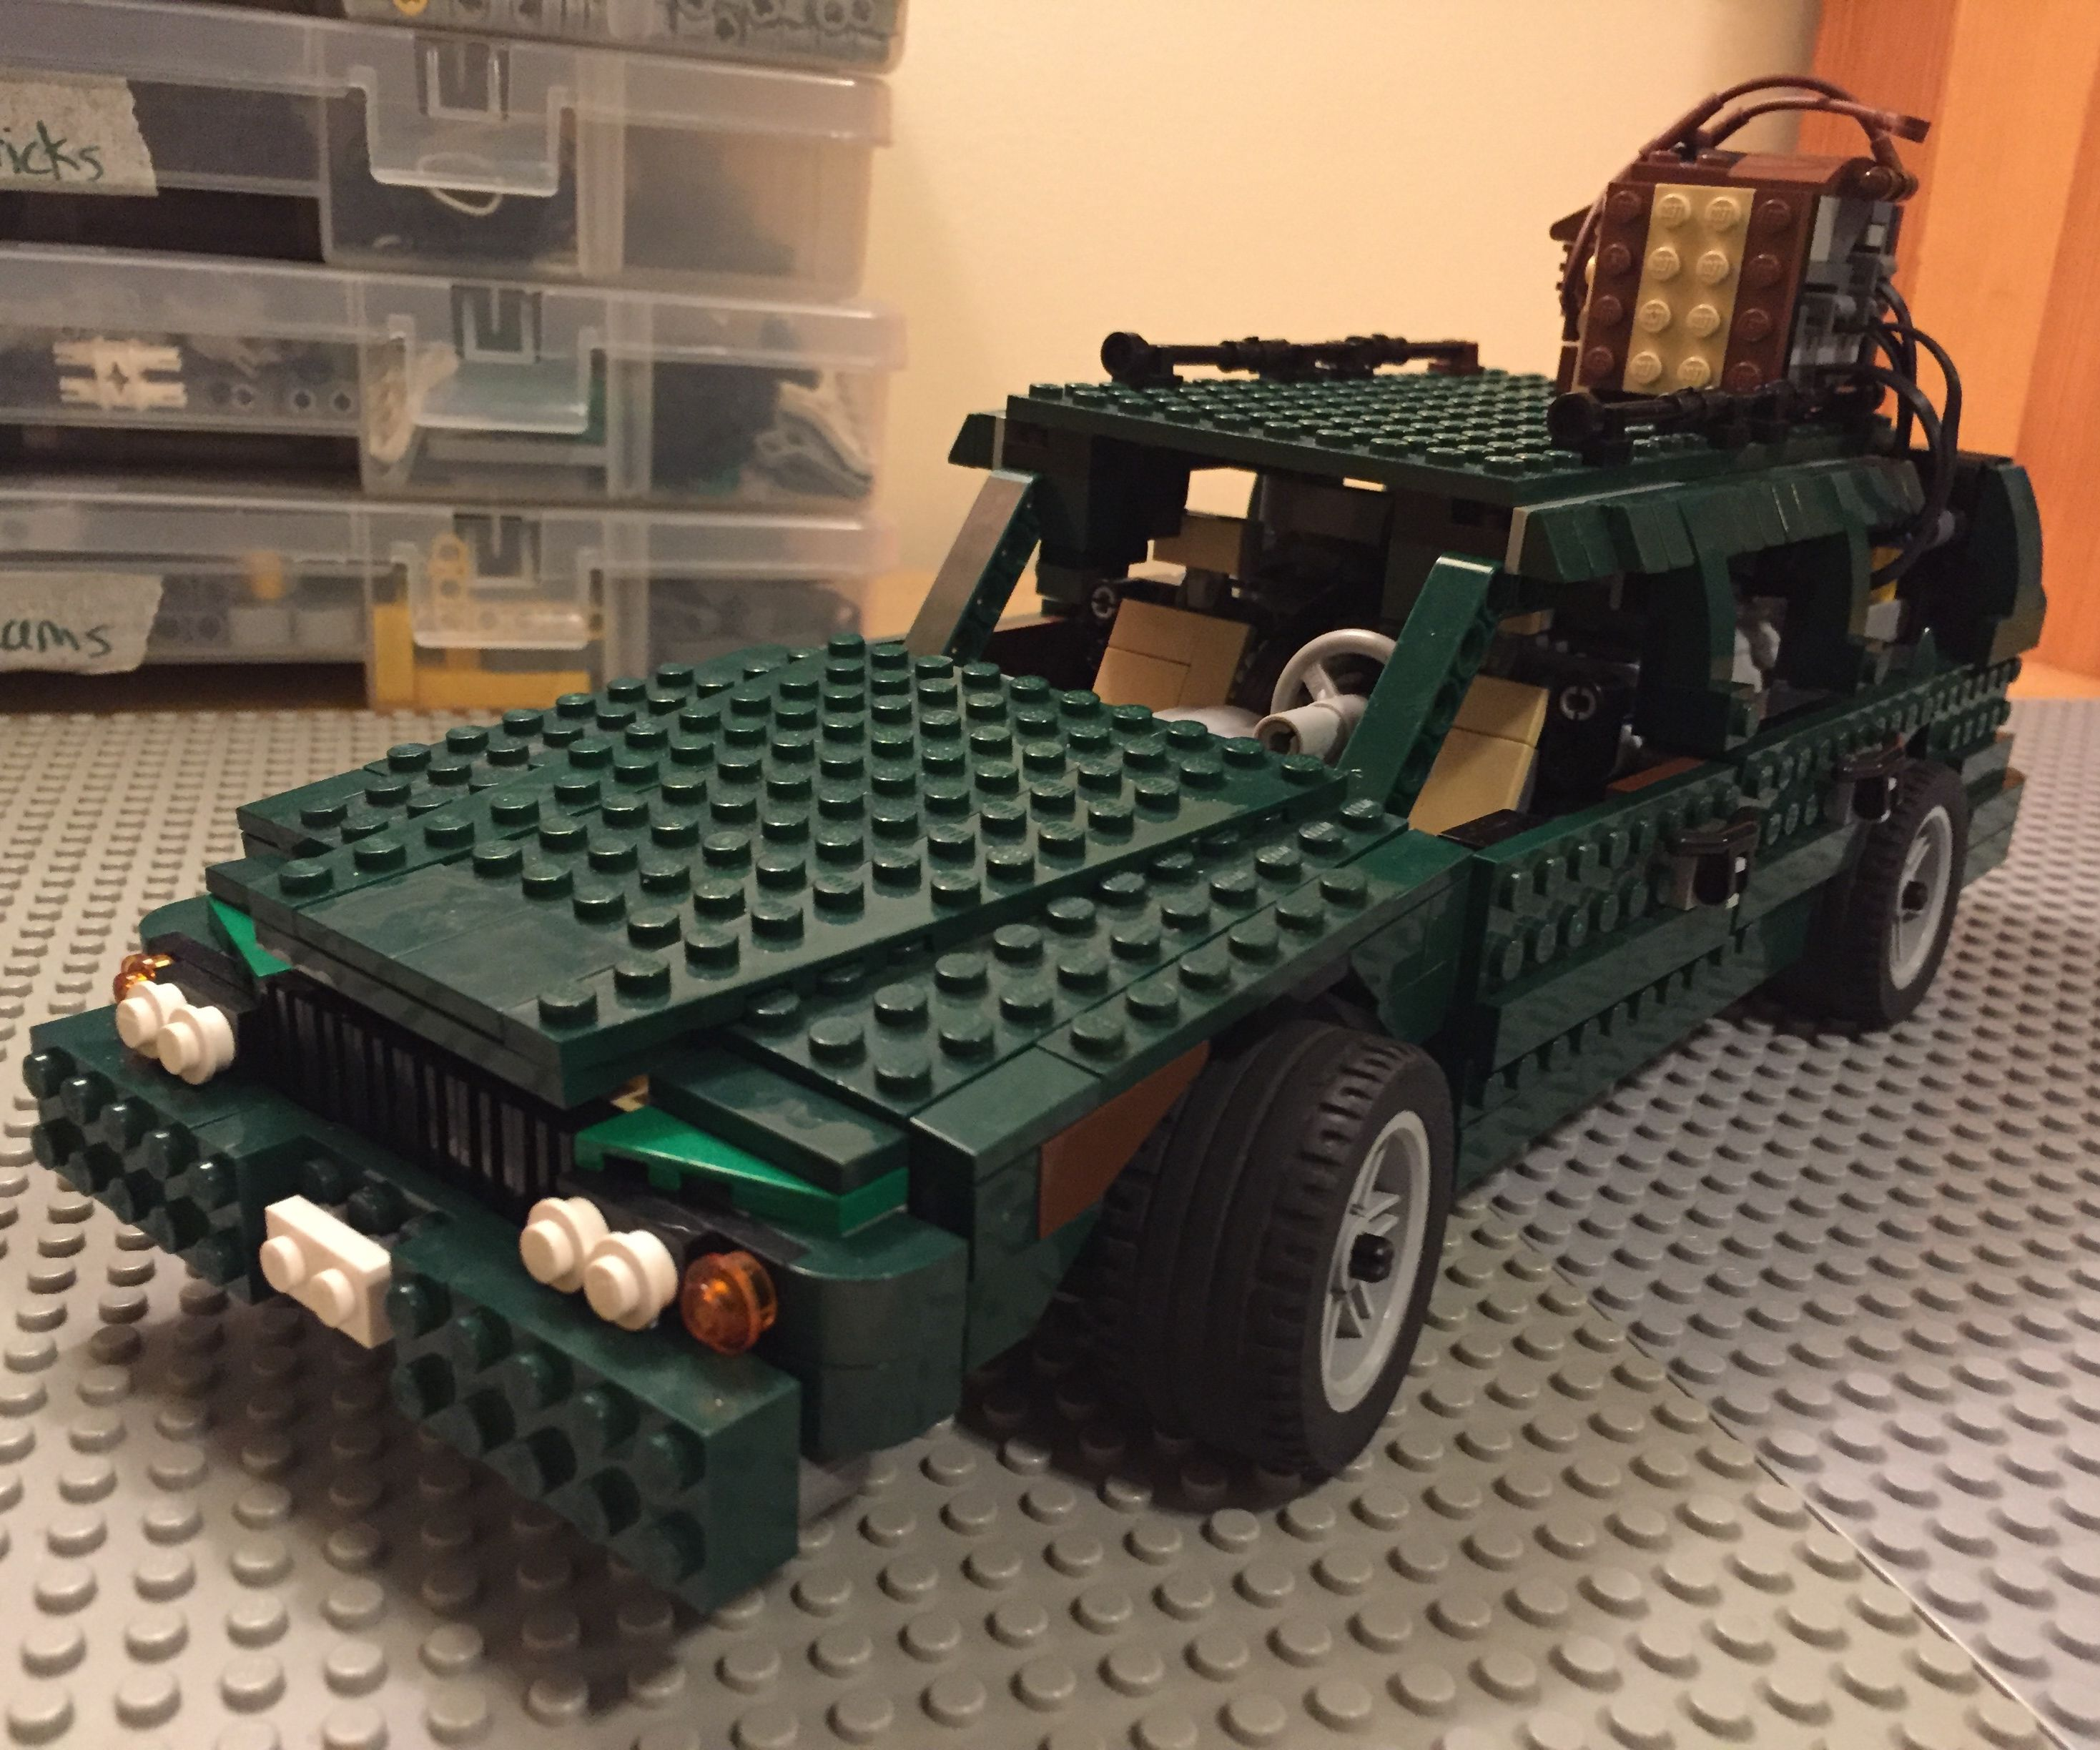 Remote Control Lego Car (1997 Volvo 850)